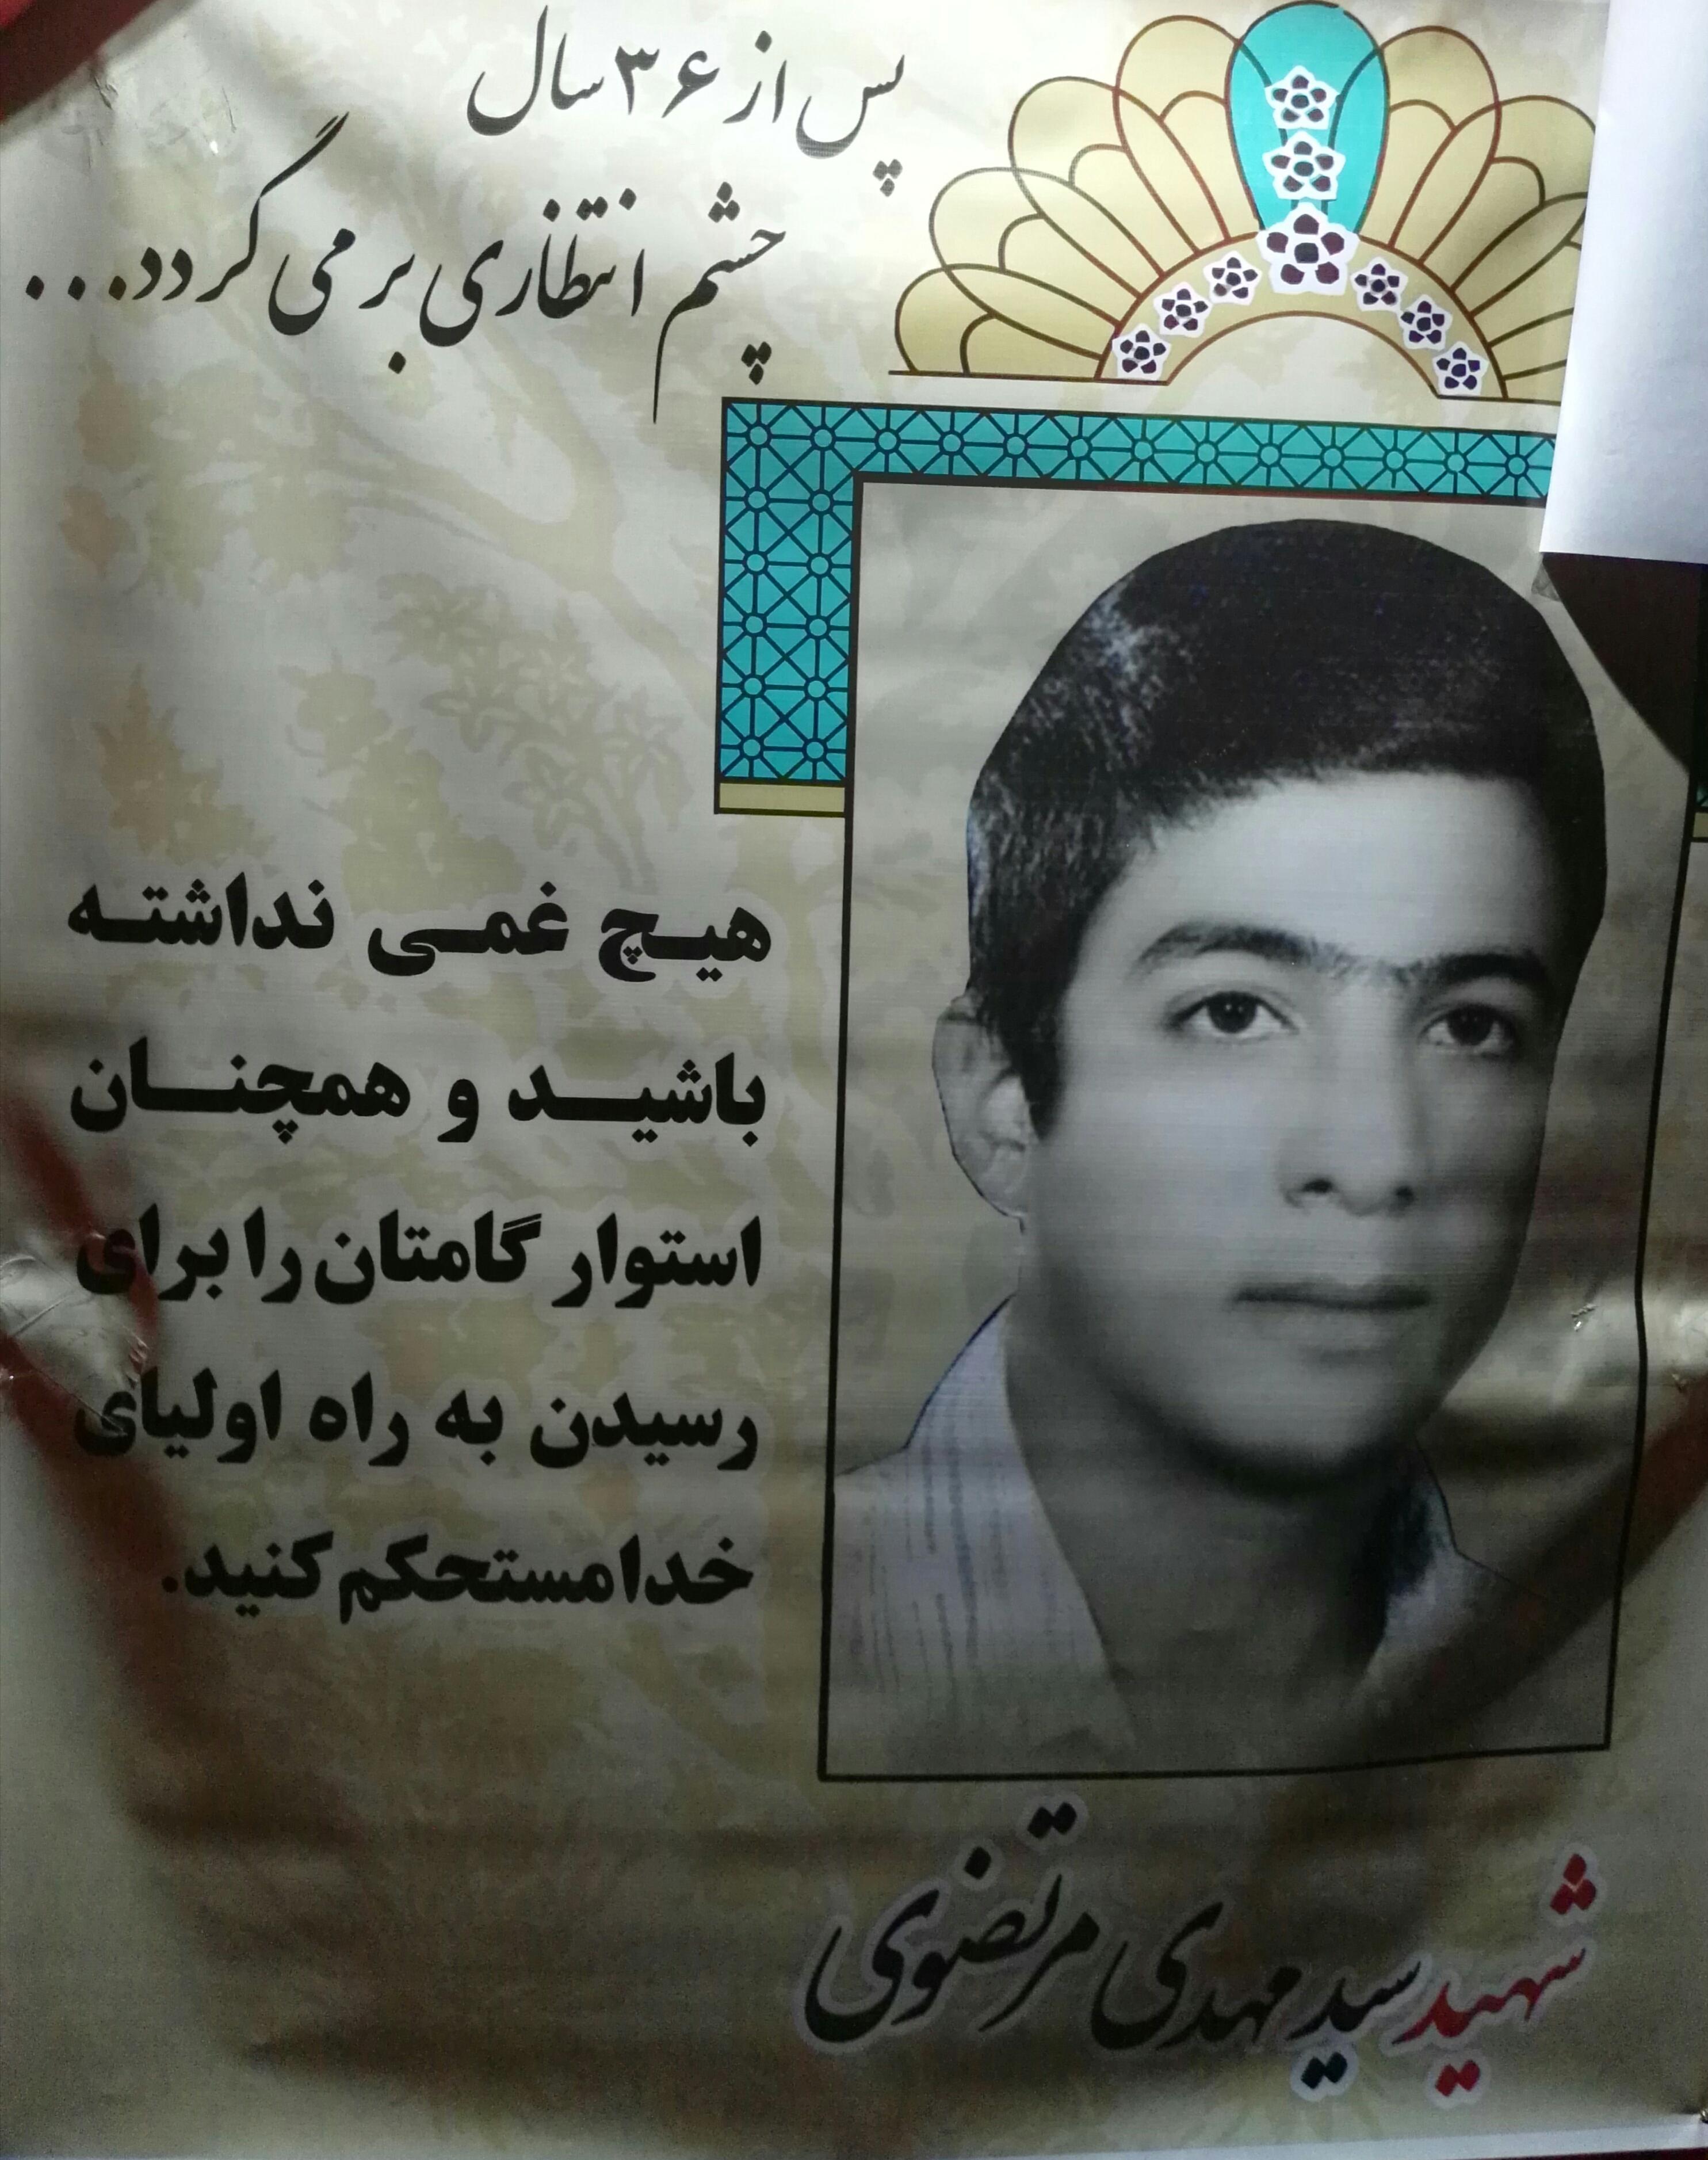 شهید سید مهدی مرتضوی